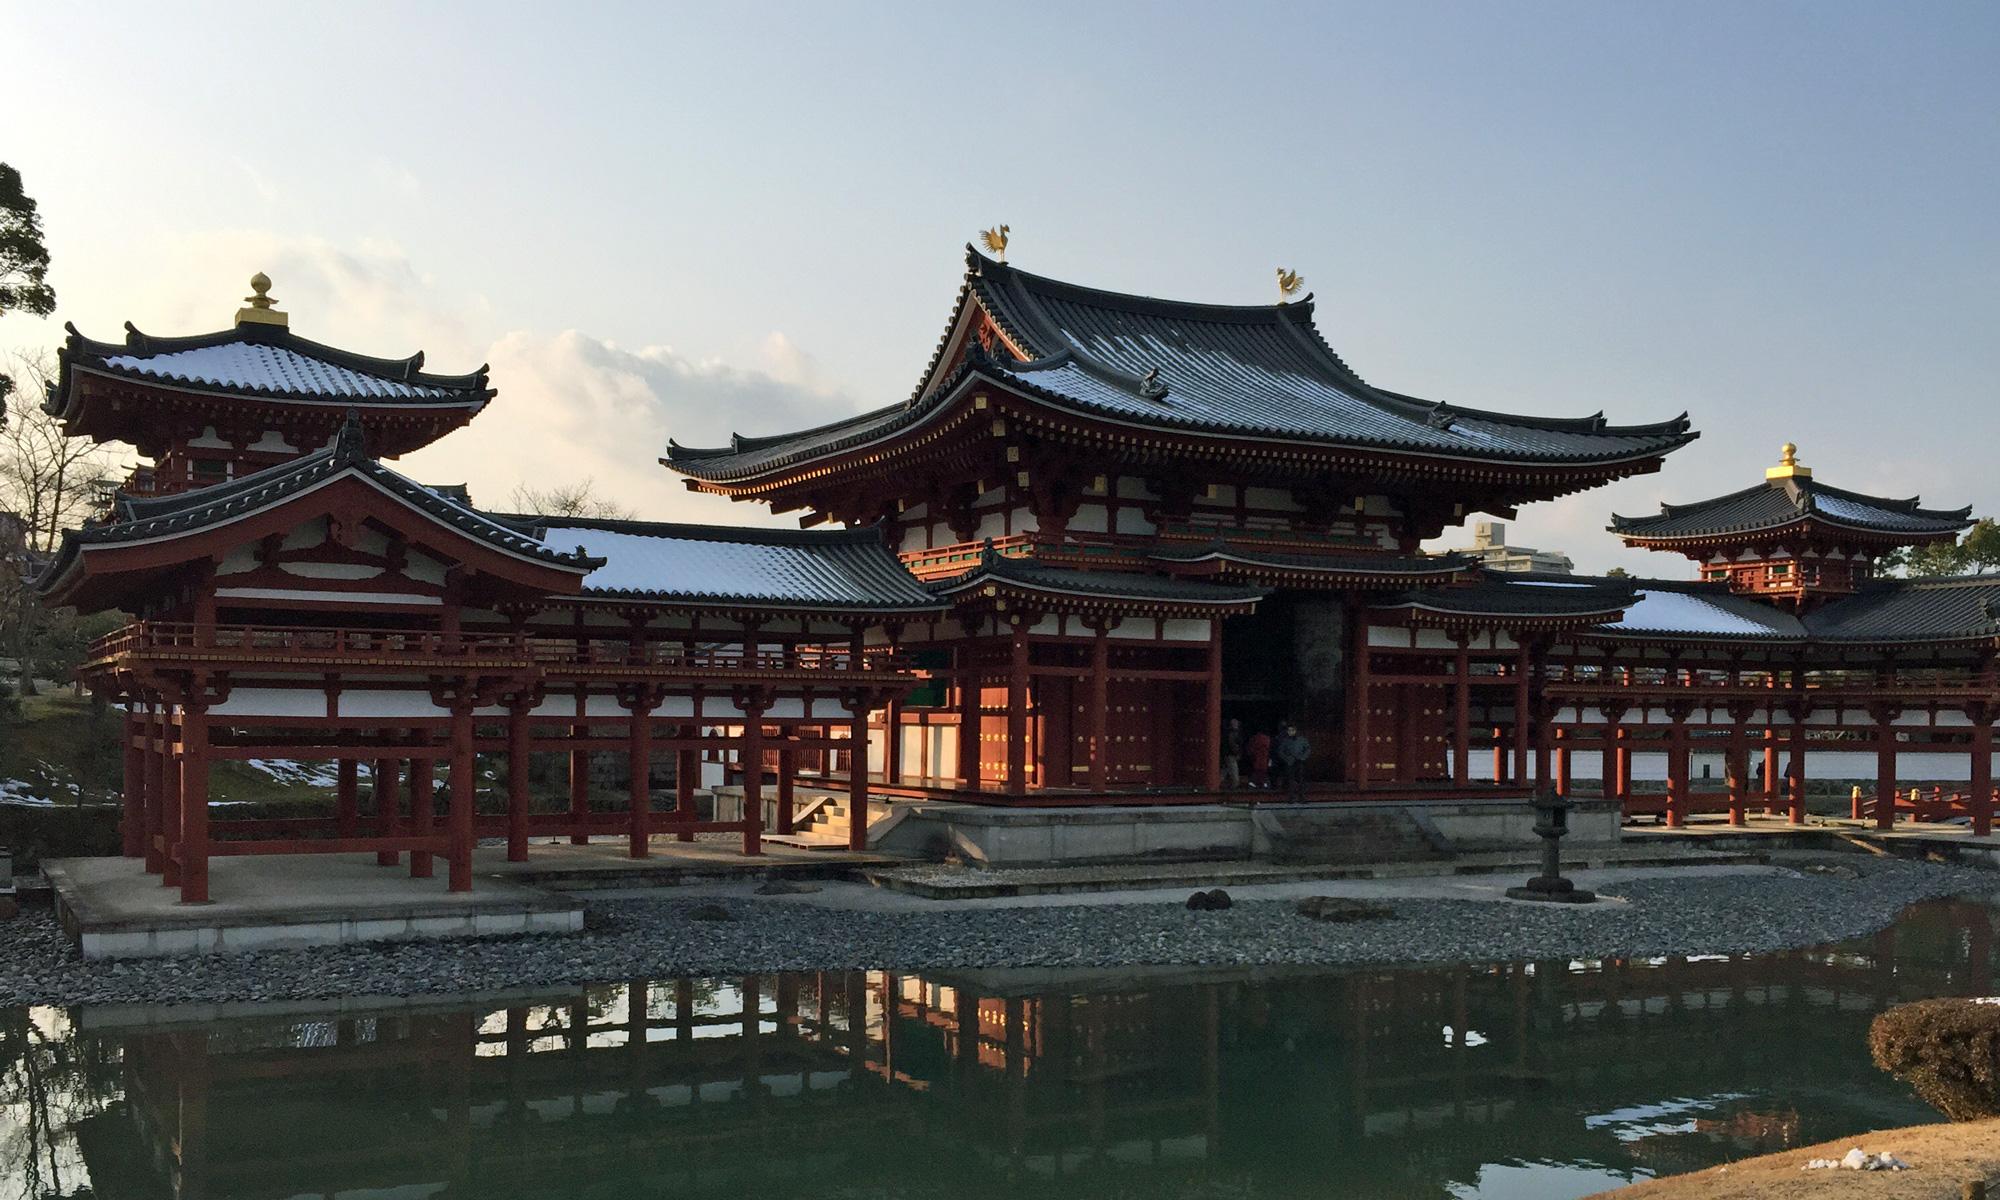 京都府立城南高等学校同窓会サポートサイト